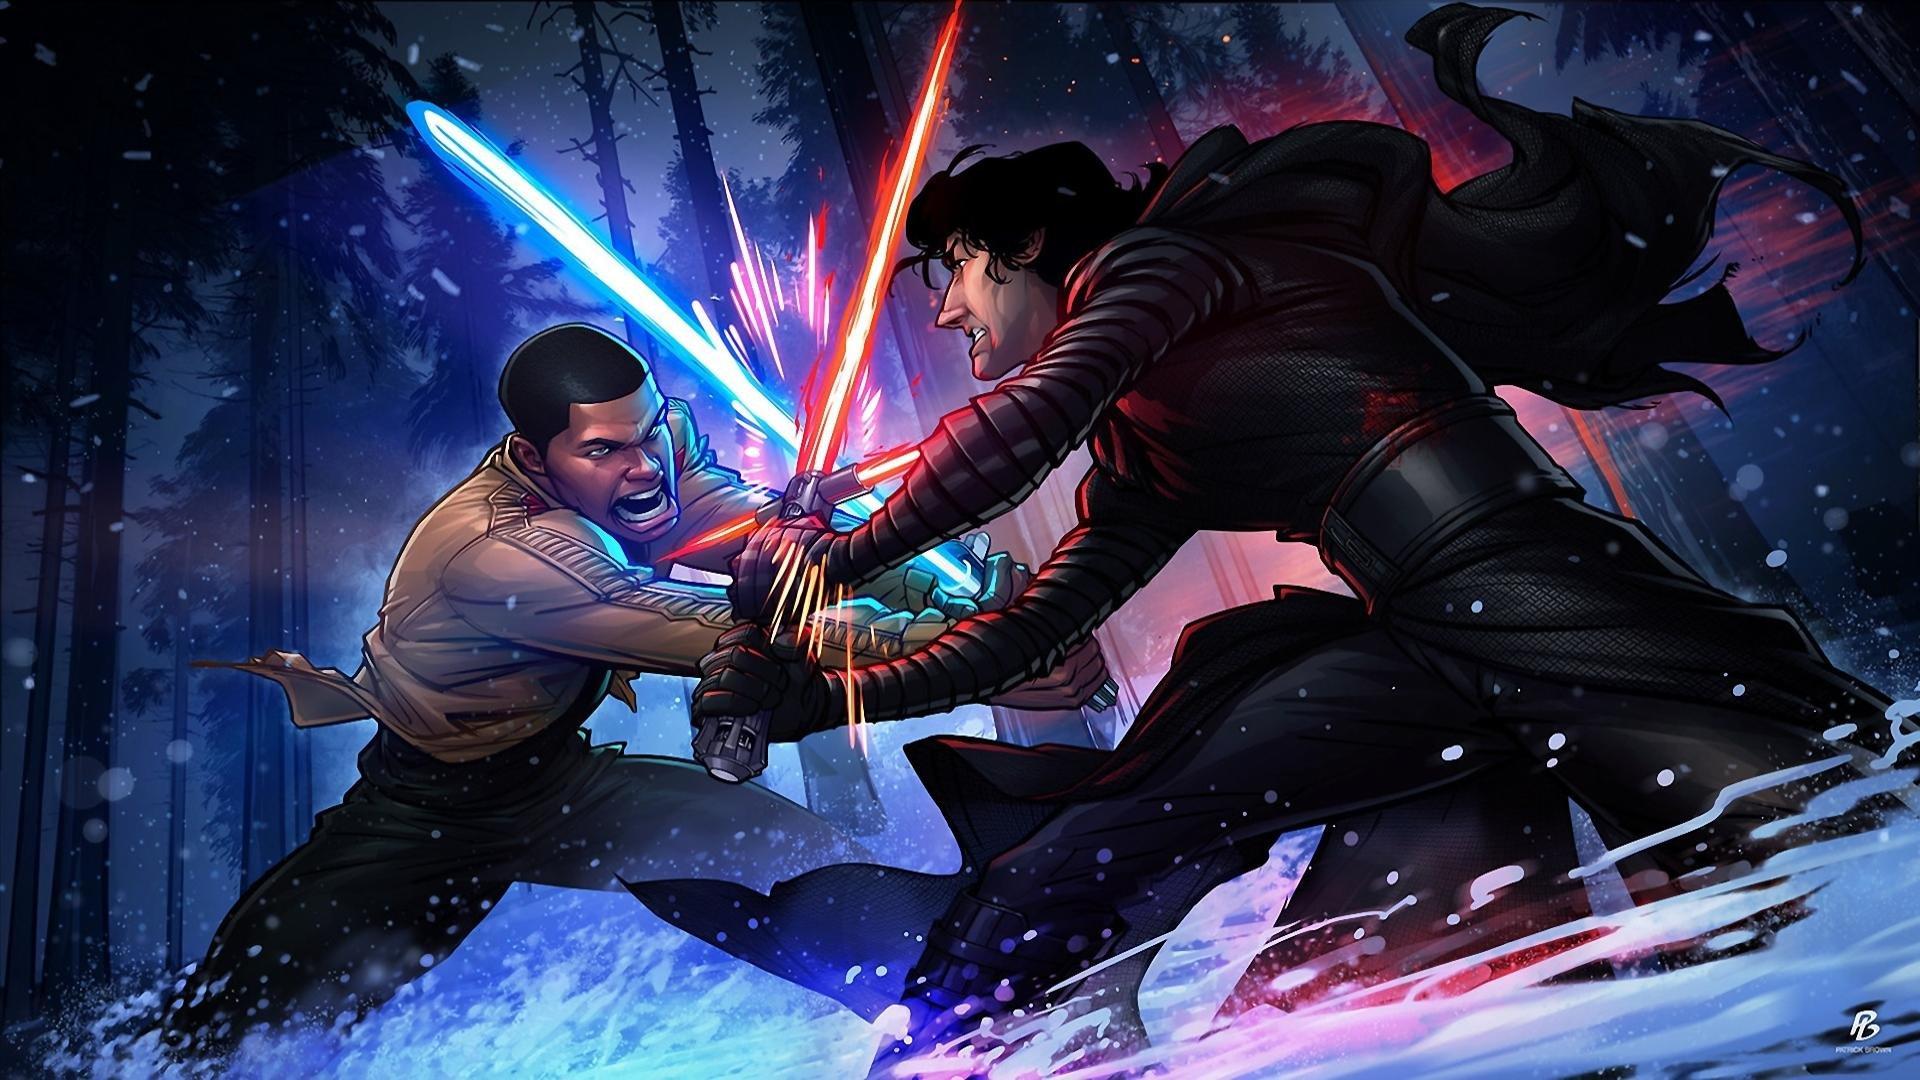 Download 1080p Star Wars Episode 7 Vii The Force Awakens Desktop Background Id 282729 For